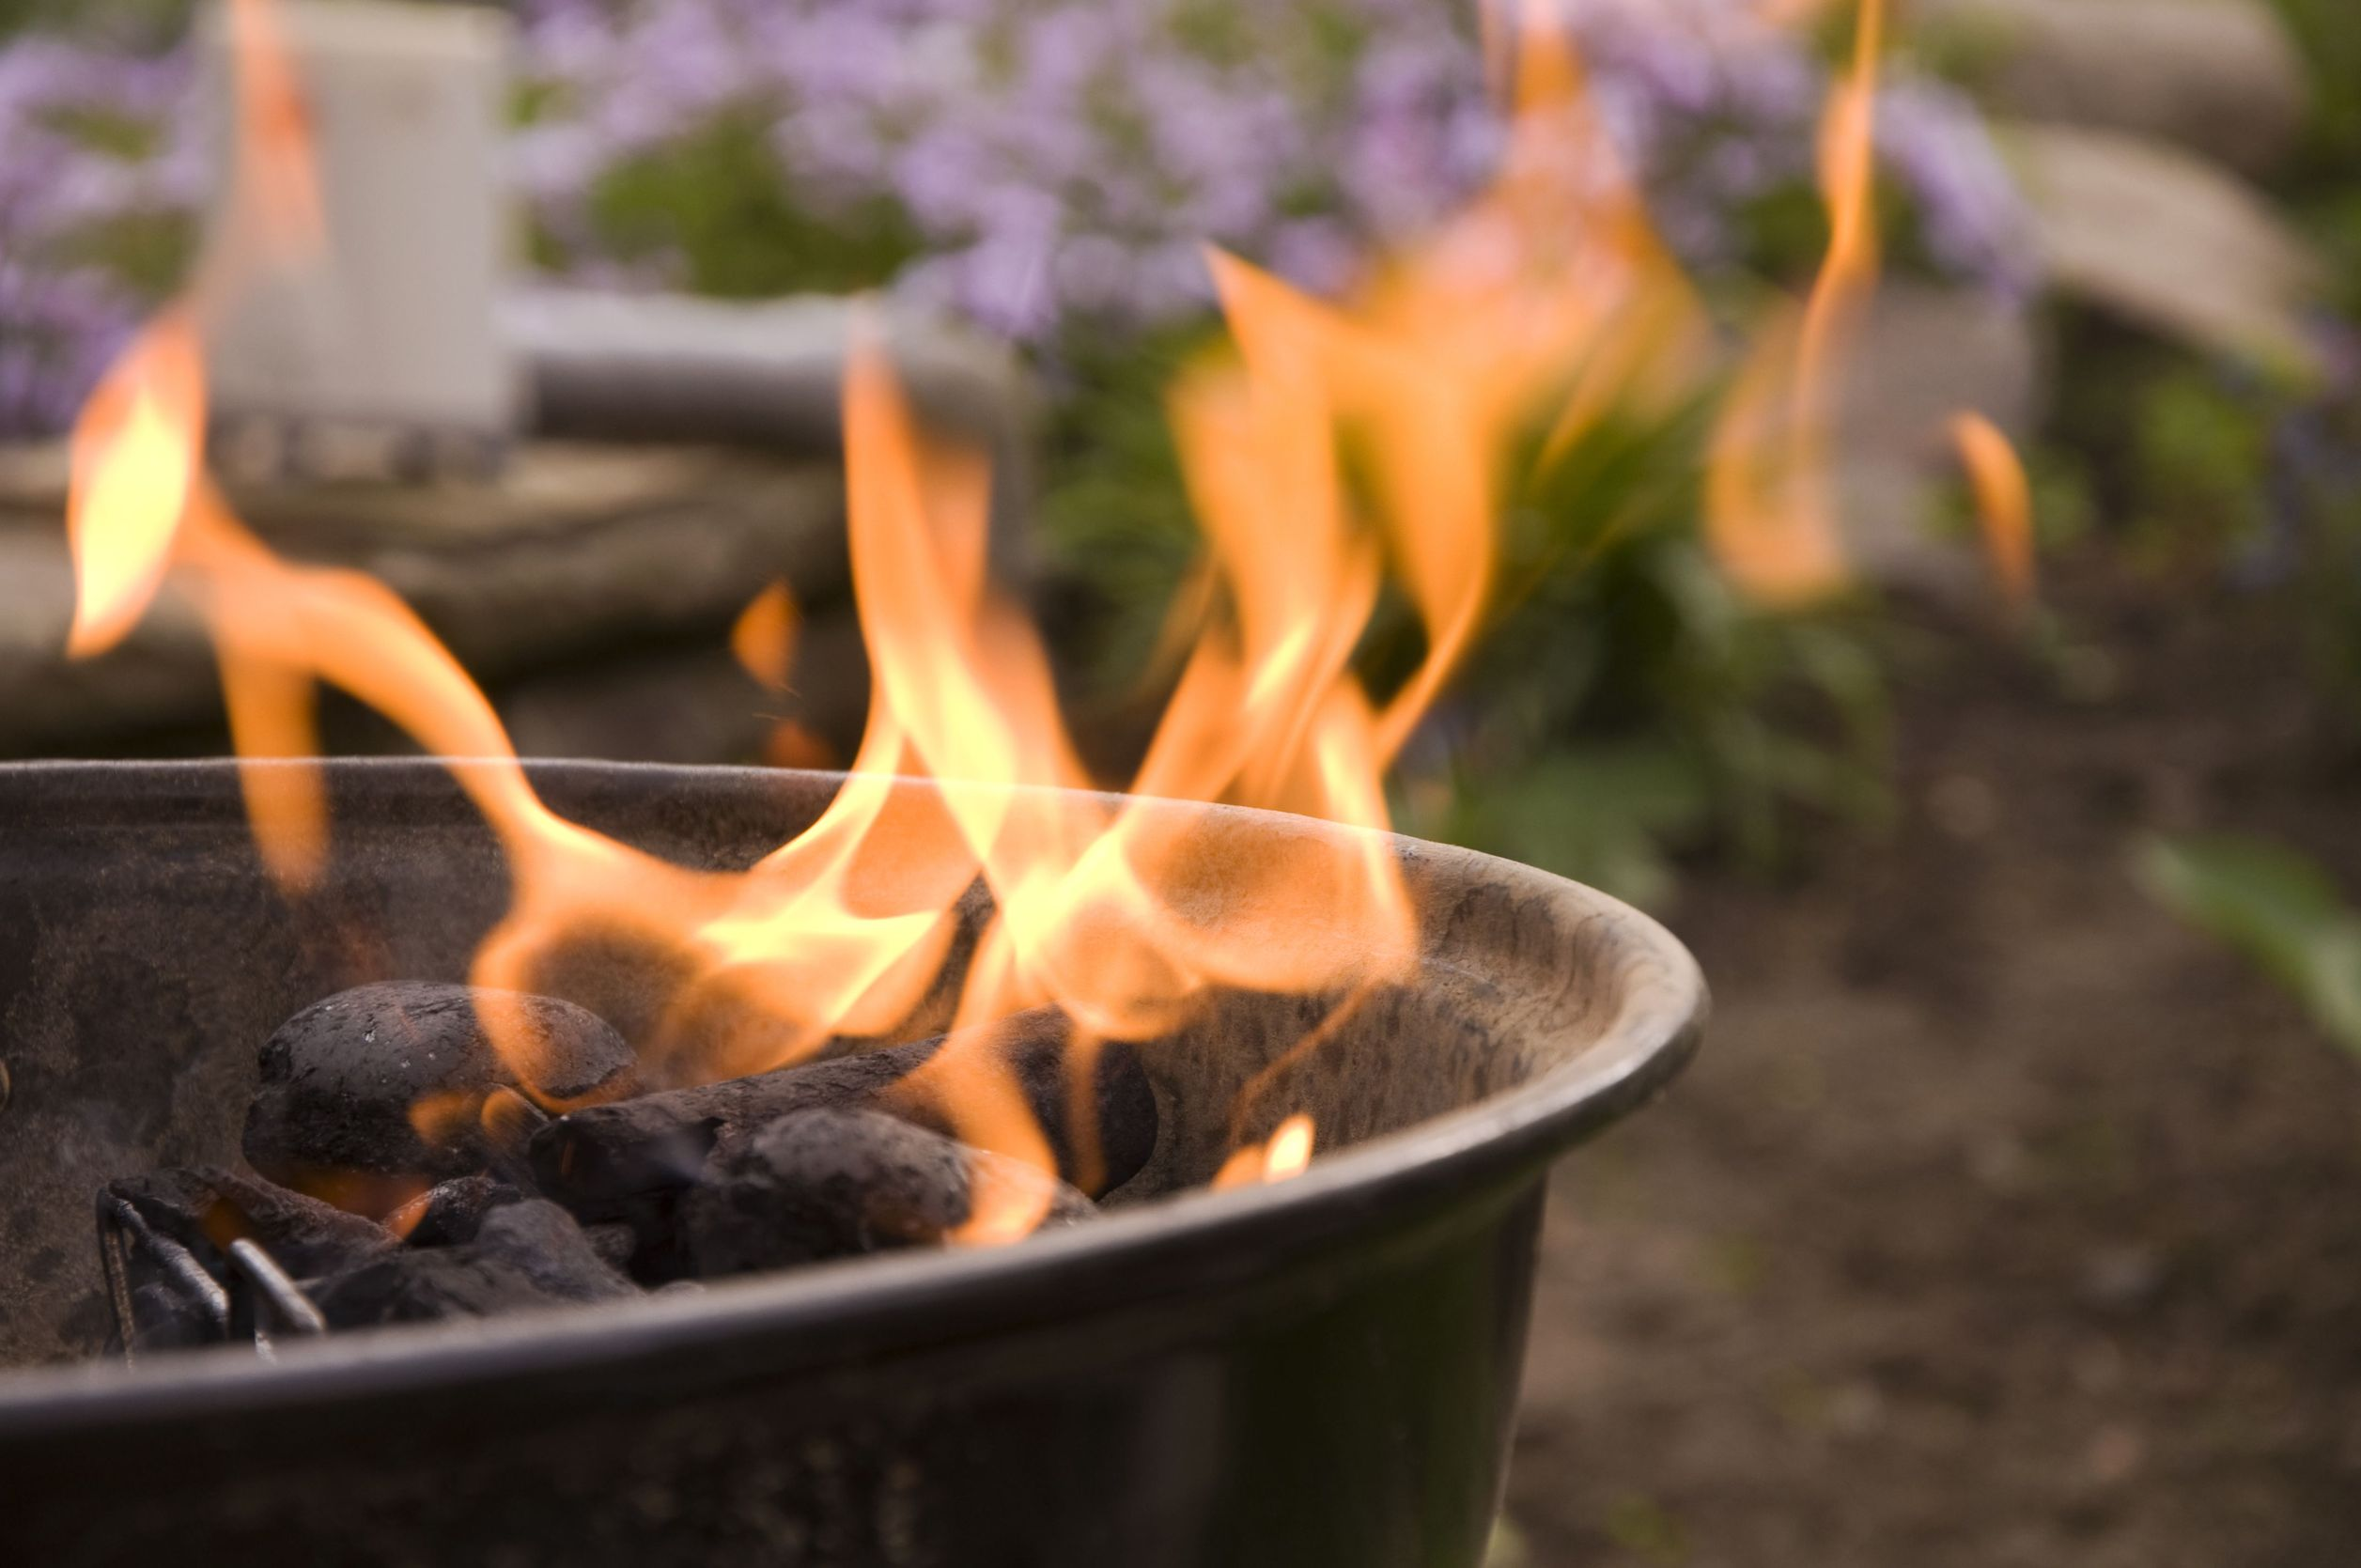 charcoal-grill-flame-nevada-usa